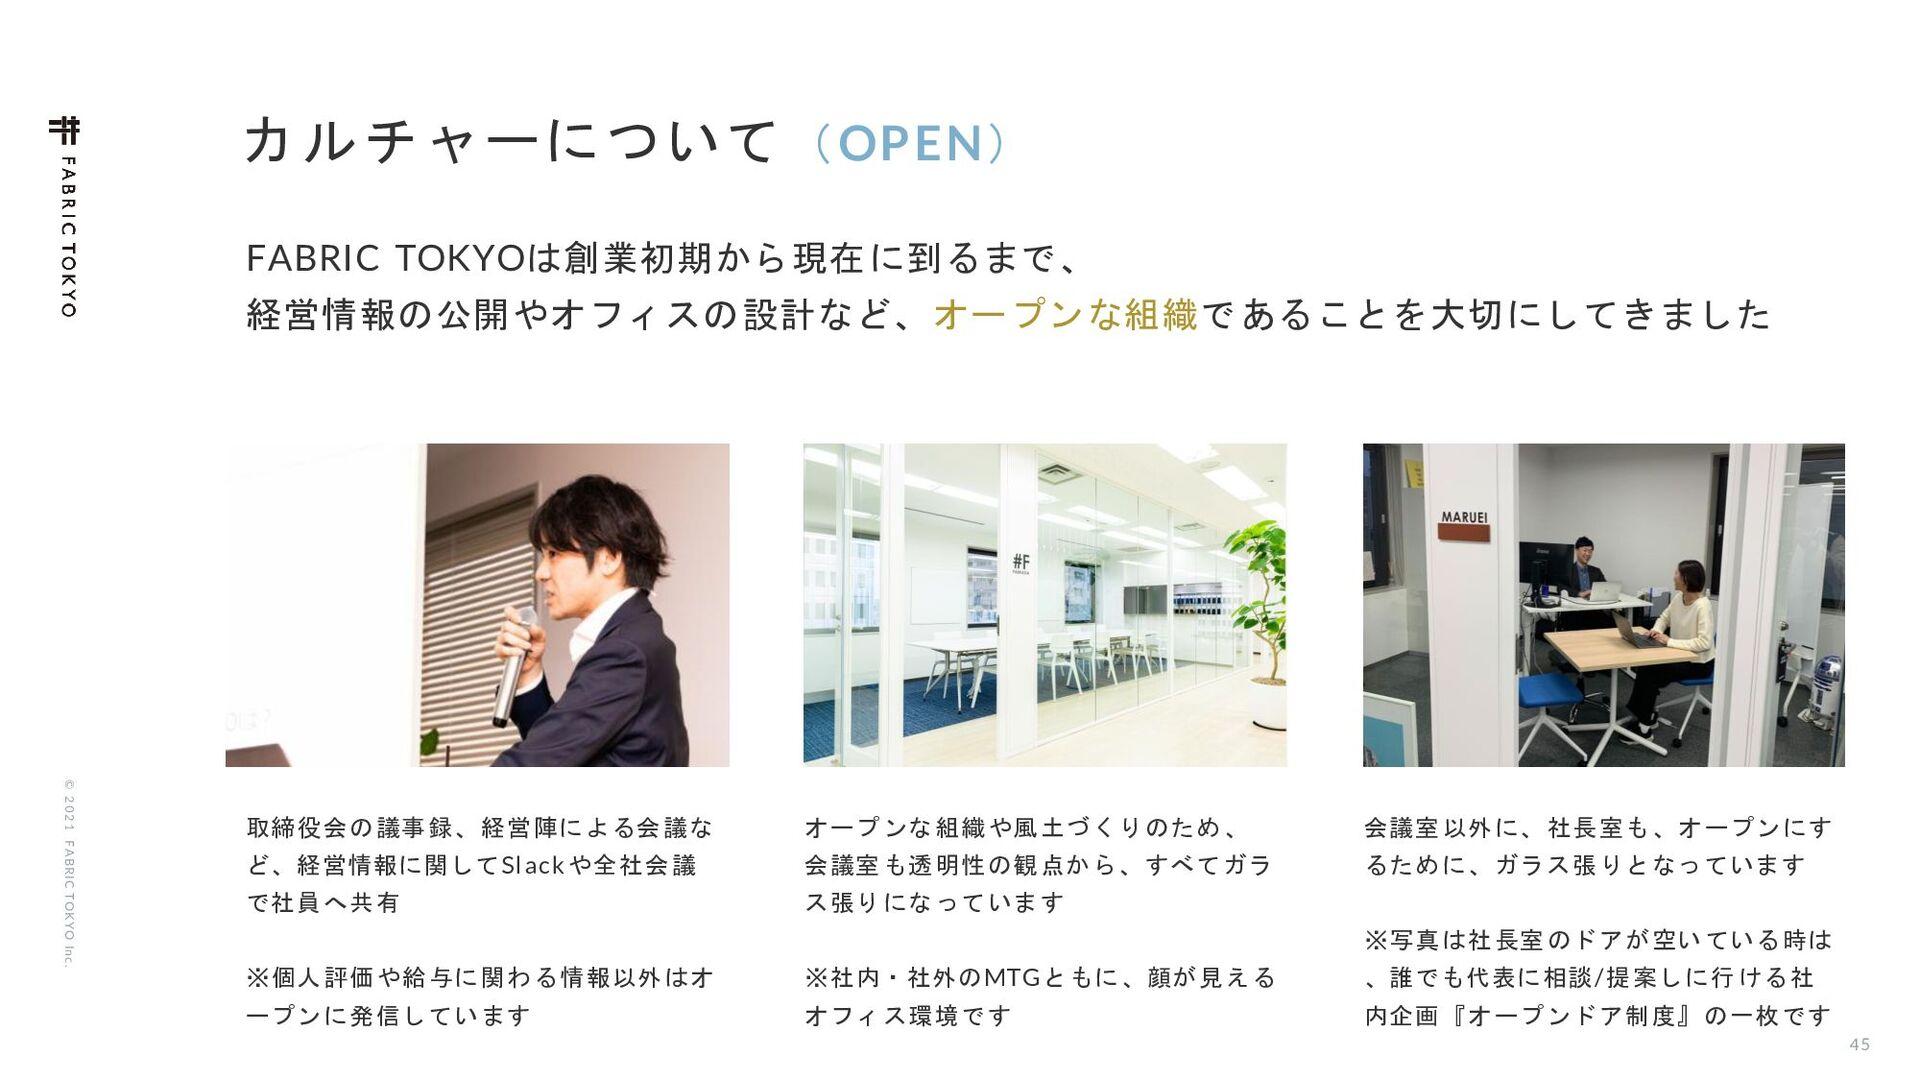 © 2021 FABRIC TOKYO Inc. 43 Χϧνϟʔʹ͍ͭͯʢ53:ʣ ࣾస৬...